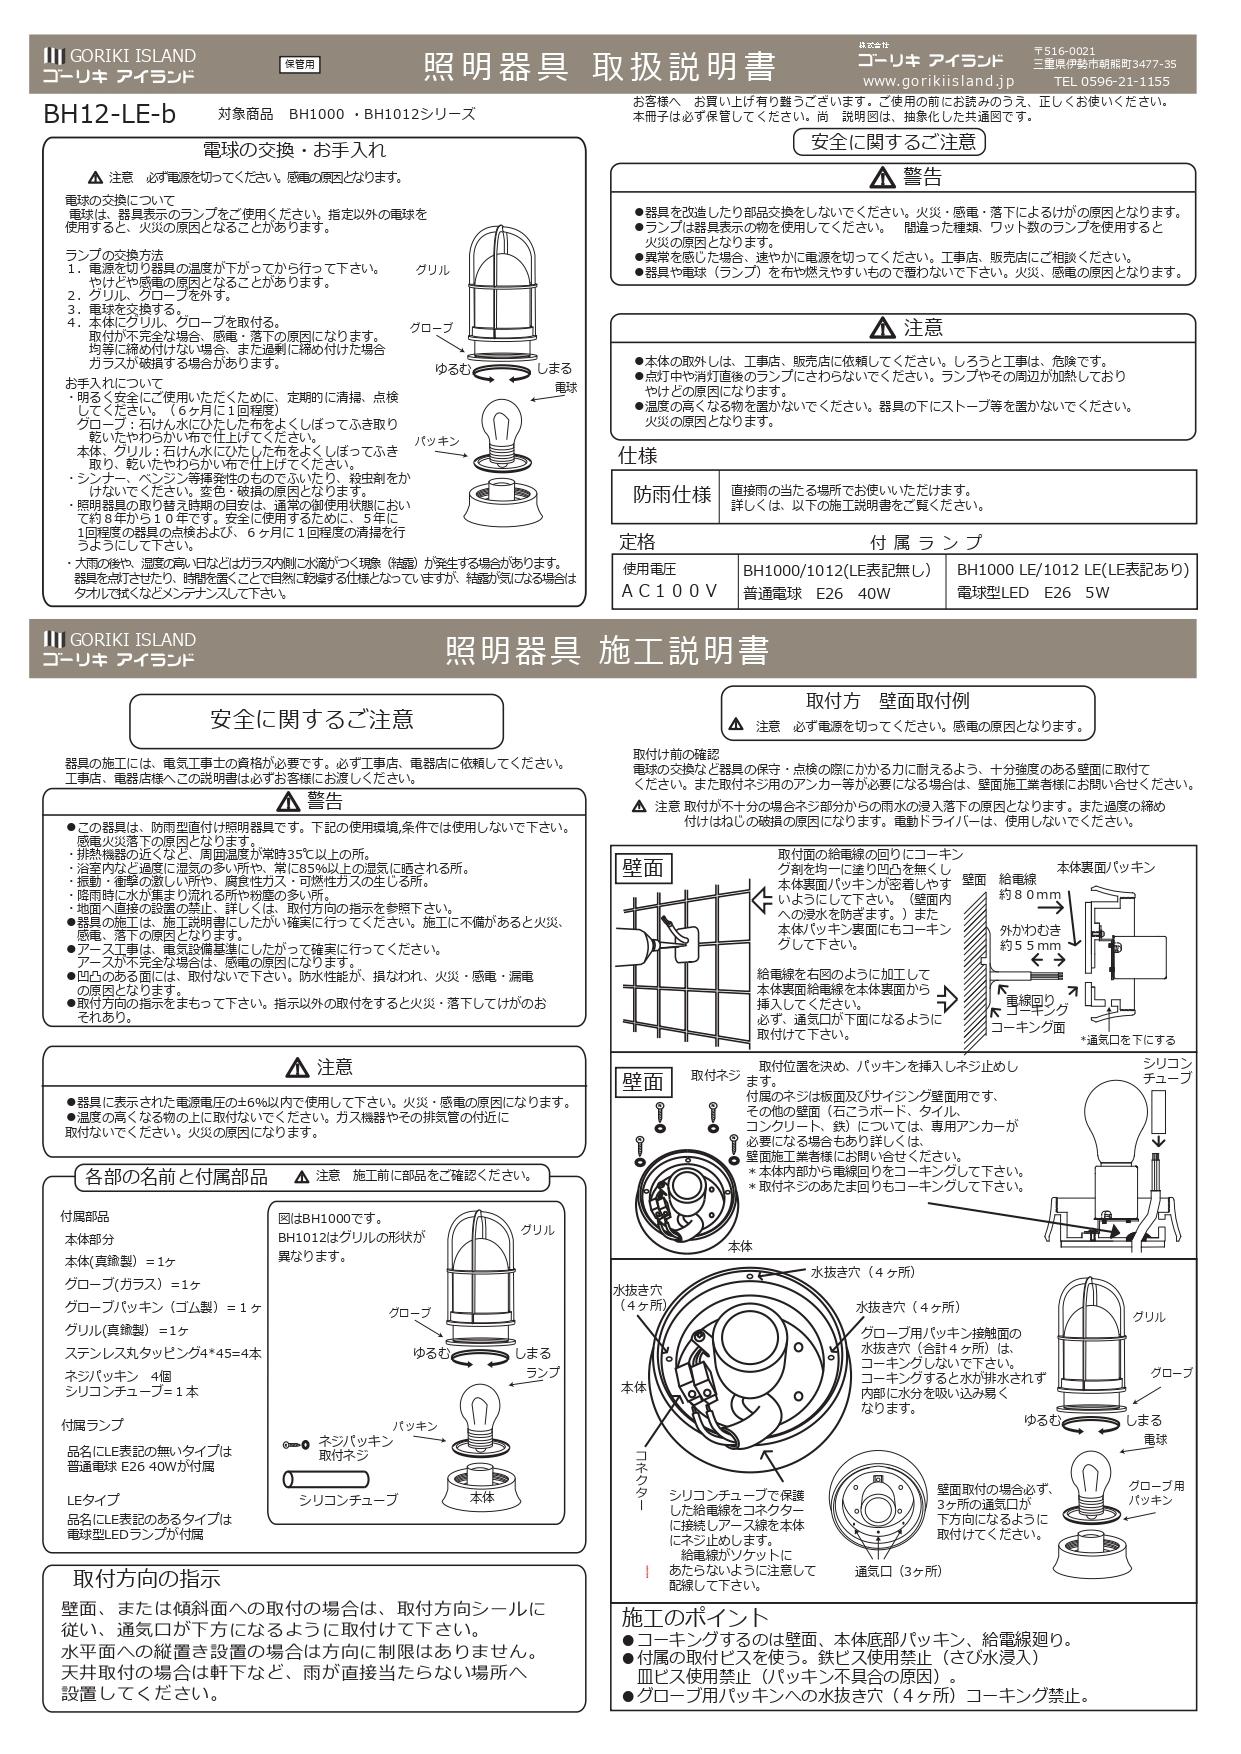 BH1000AN 施工説明書_page-0001